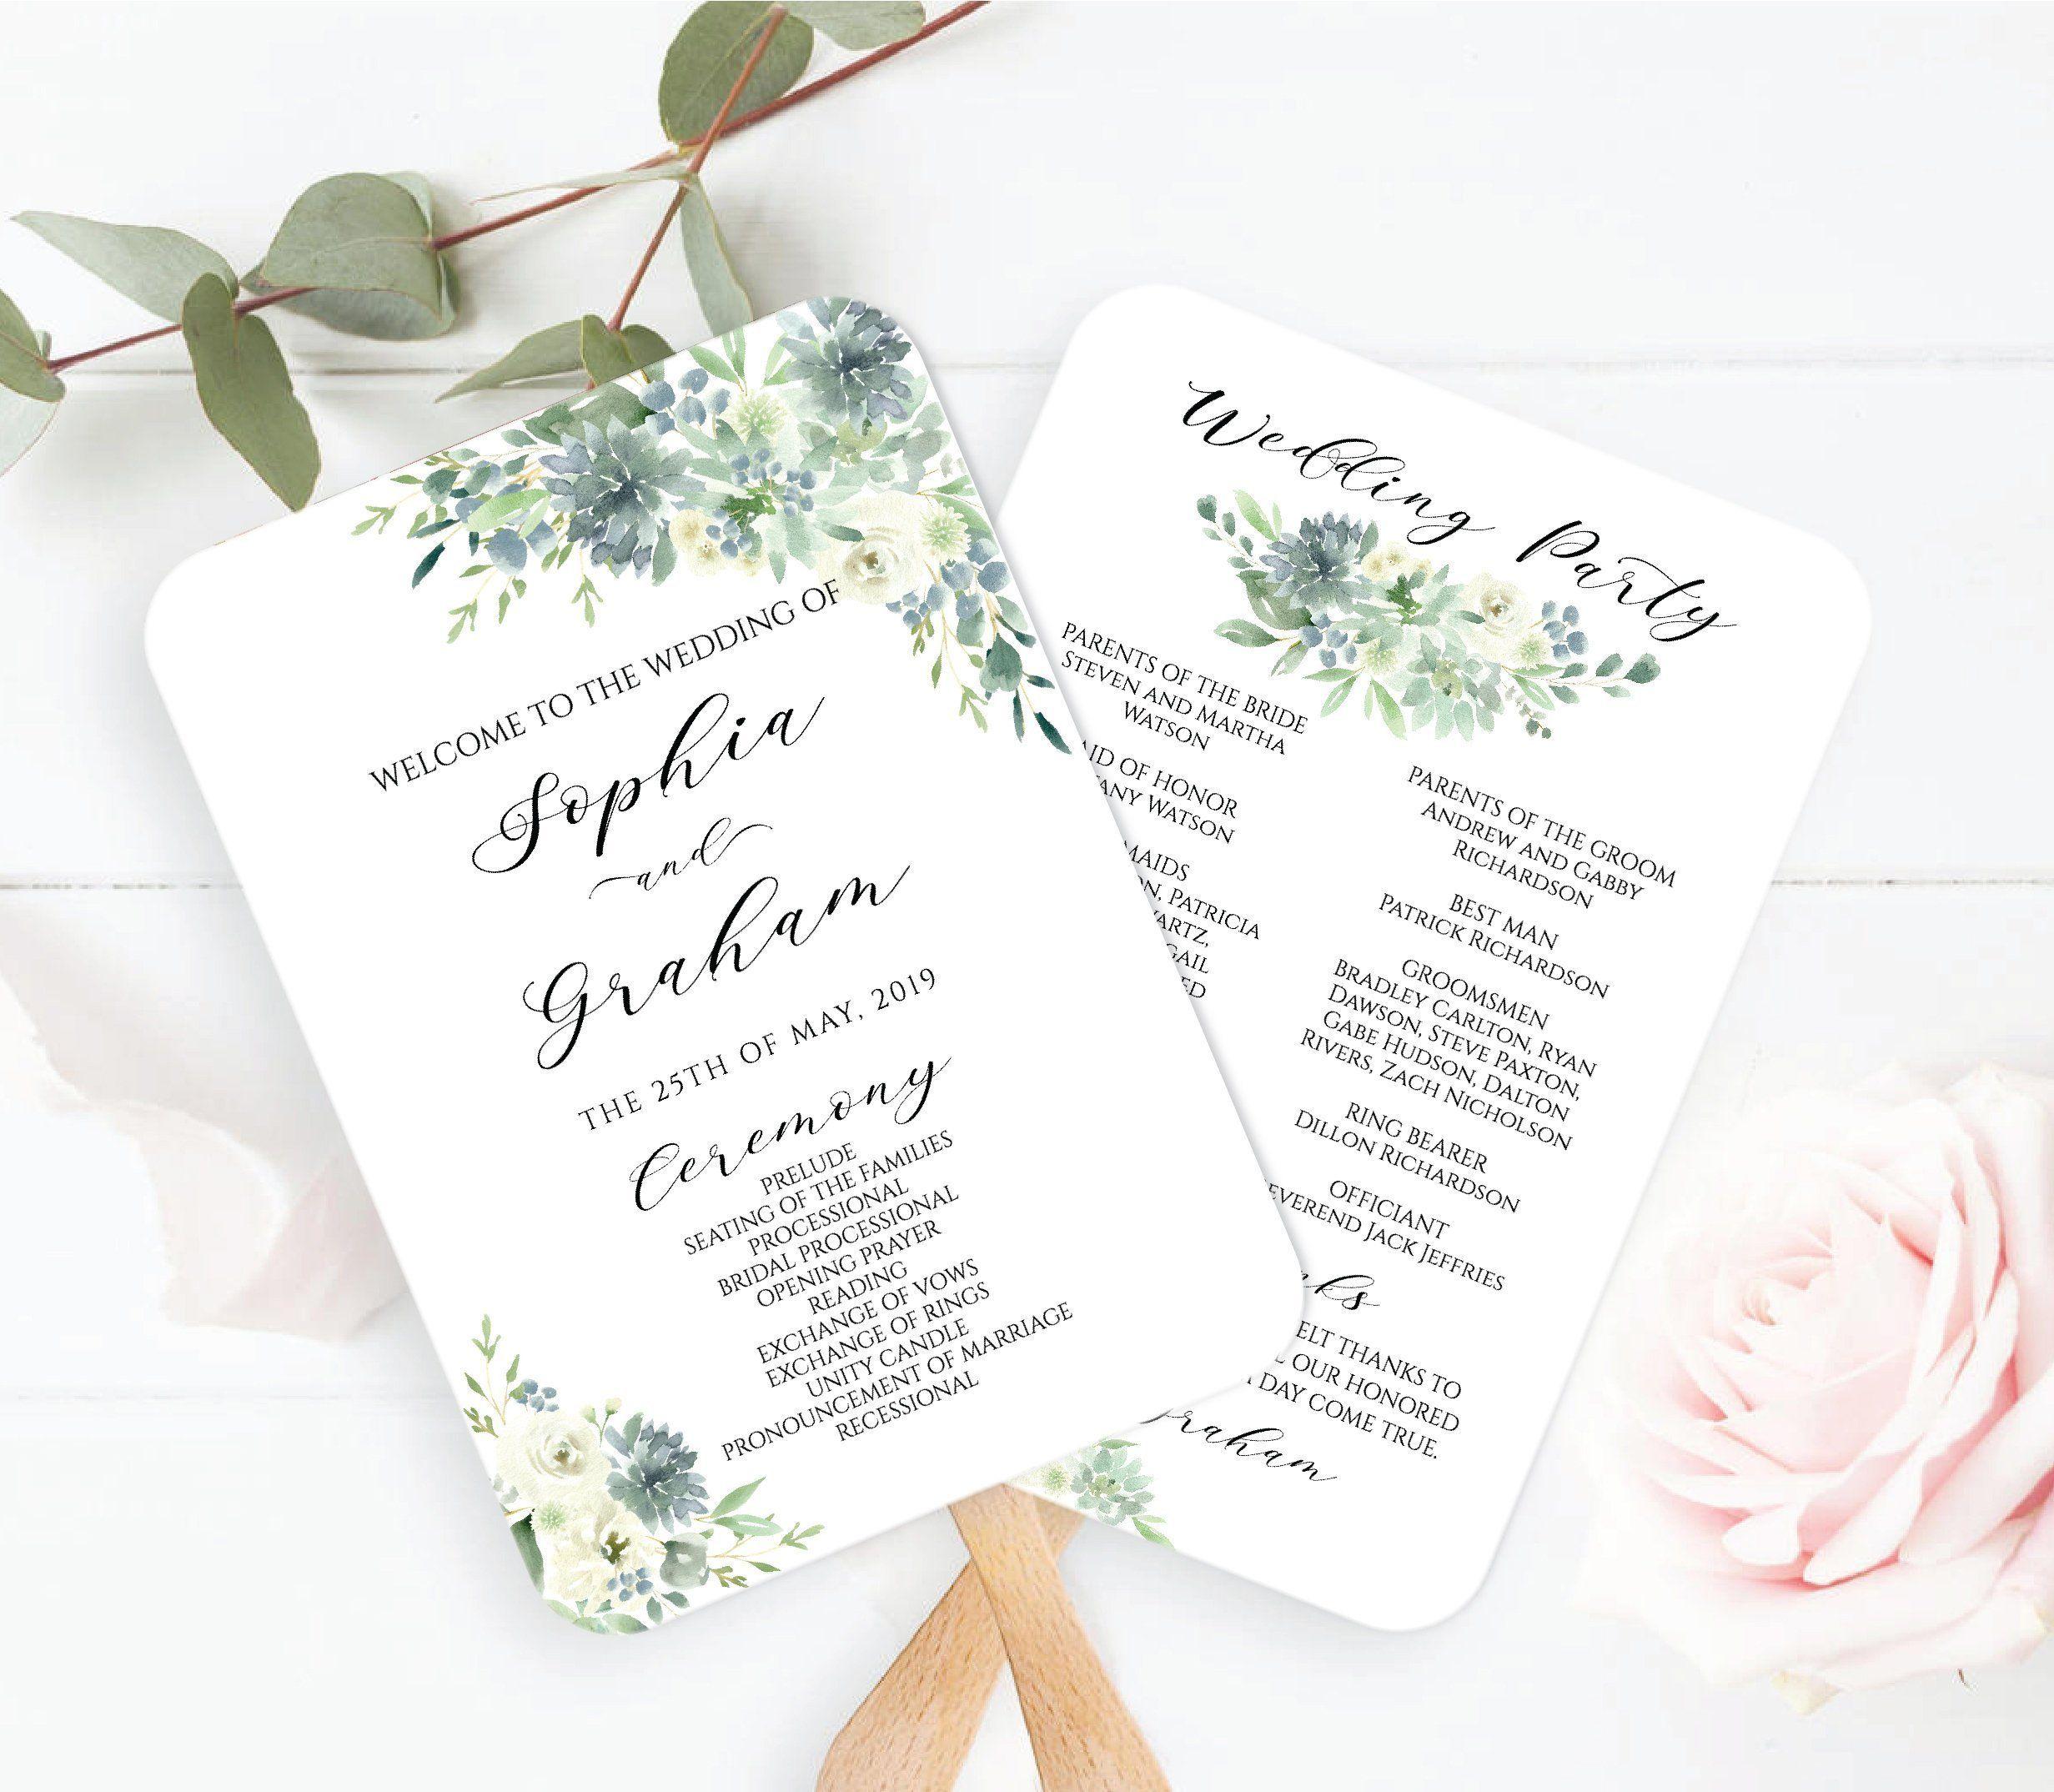 Printable Dusty Blue And Greenery Wedding Program Fan Template Botanical Succulent Diy Editable Ceremony Program Instant Download Mp102 Wedding Program Fans Wedding Programs Diy Wedding Programs